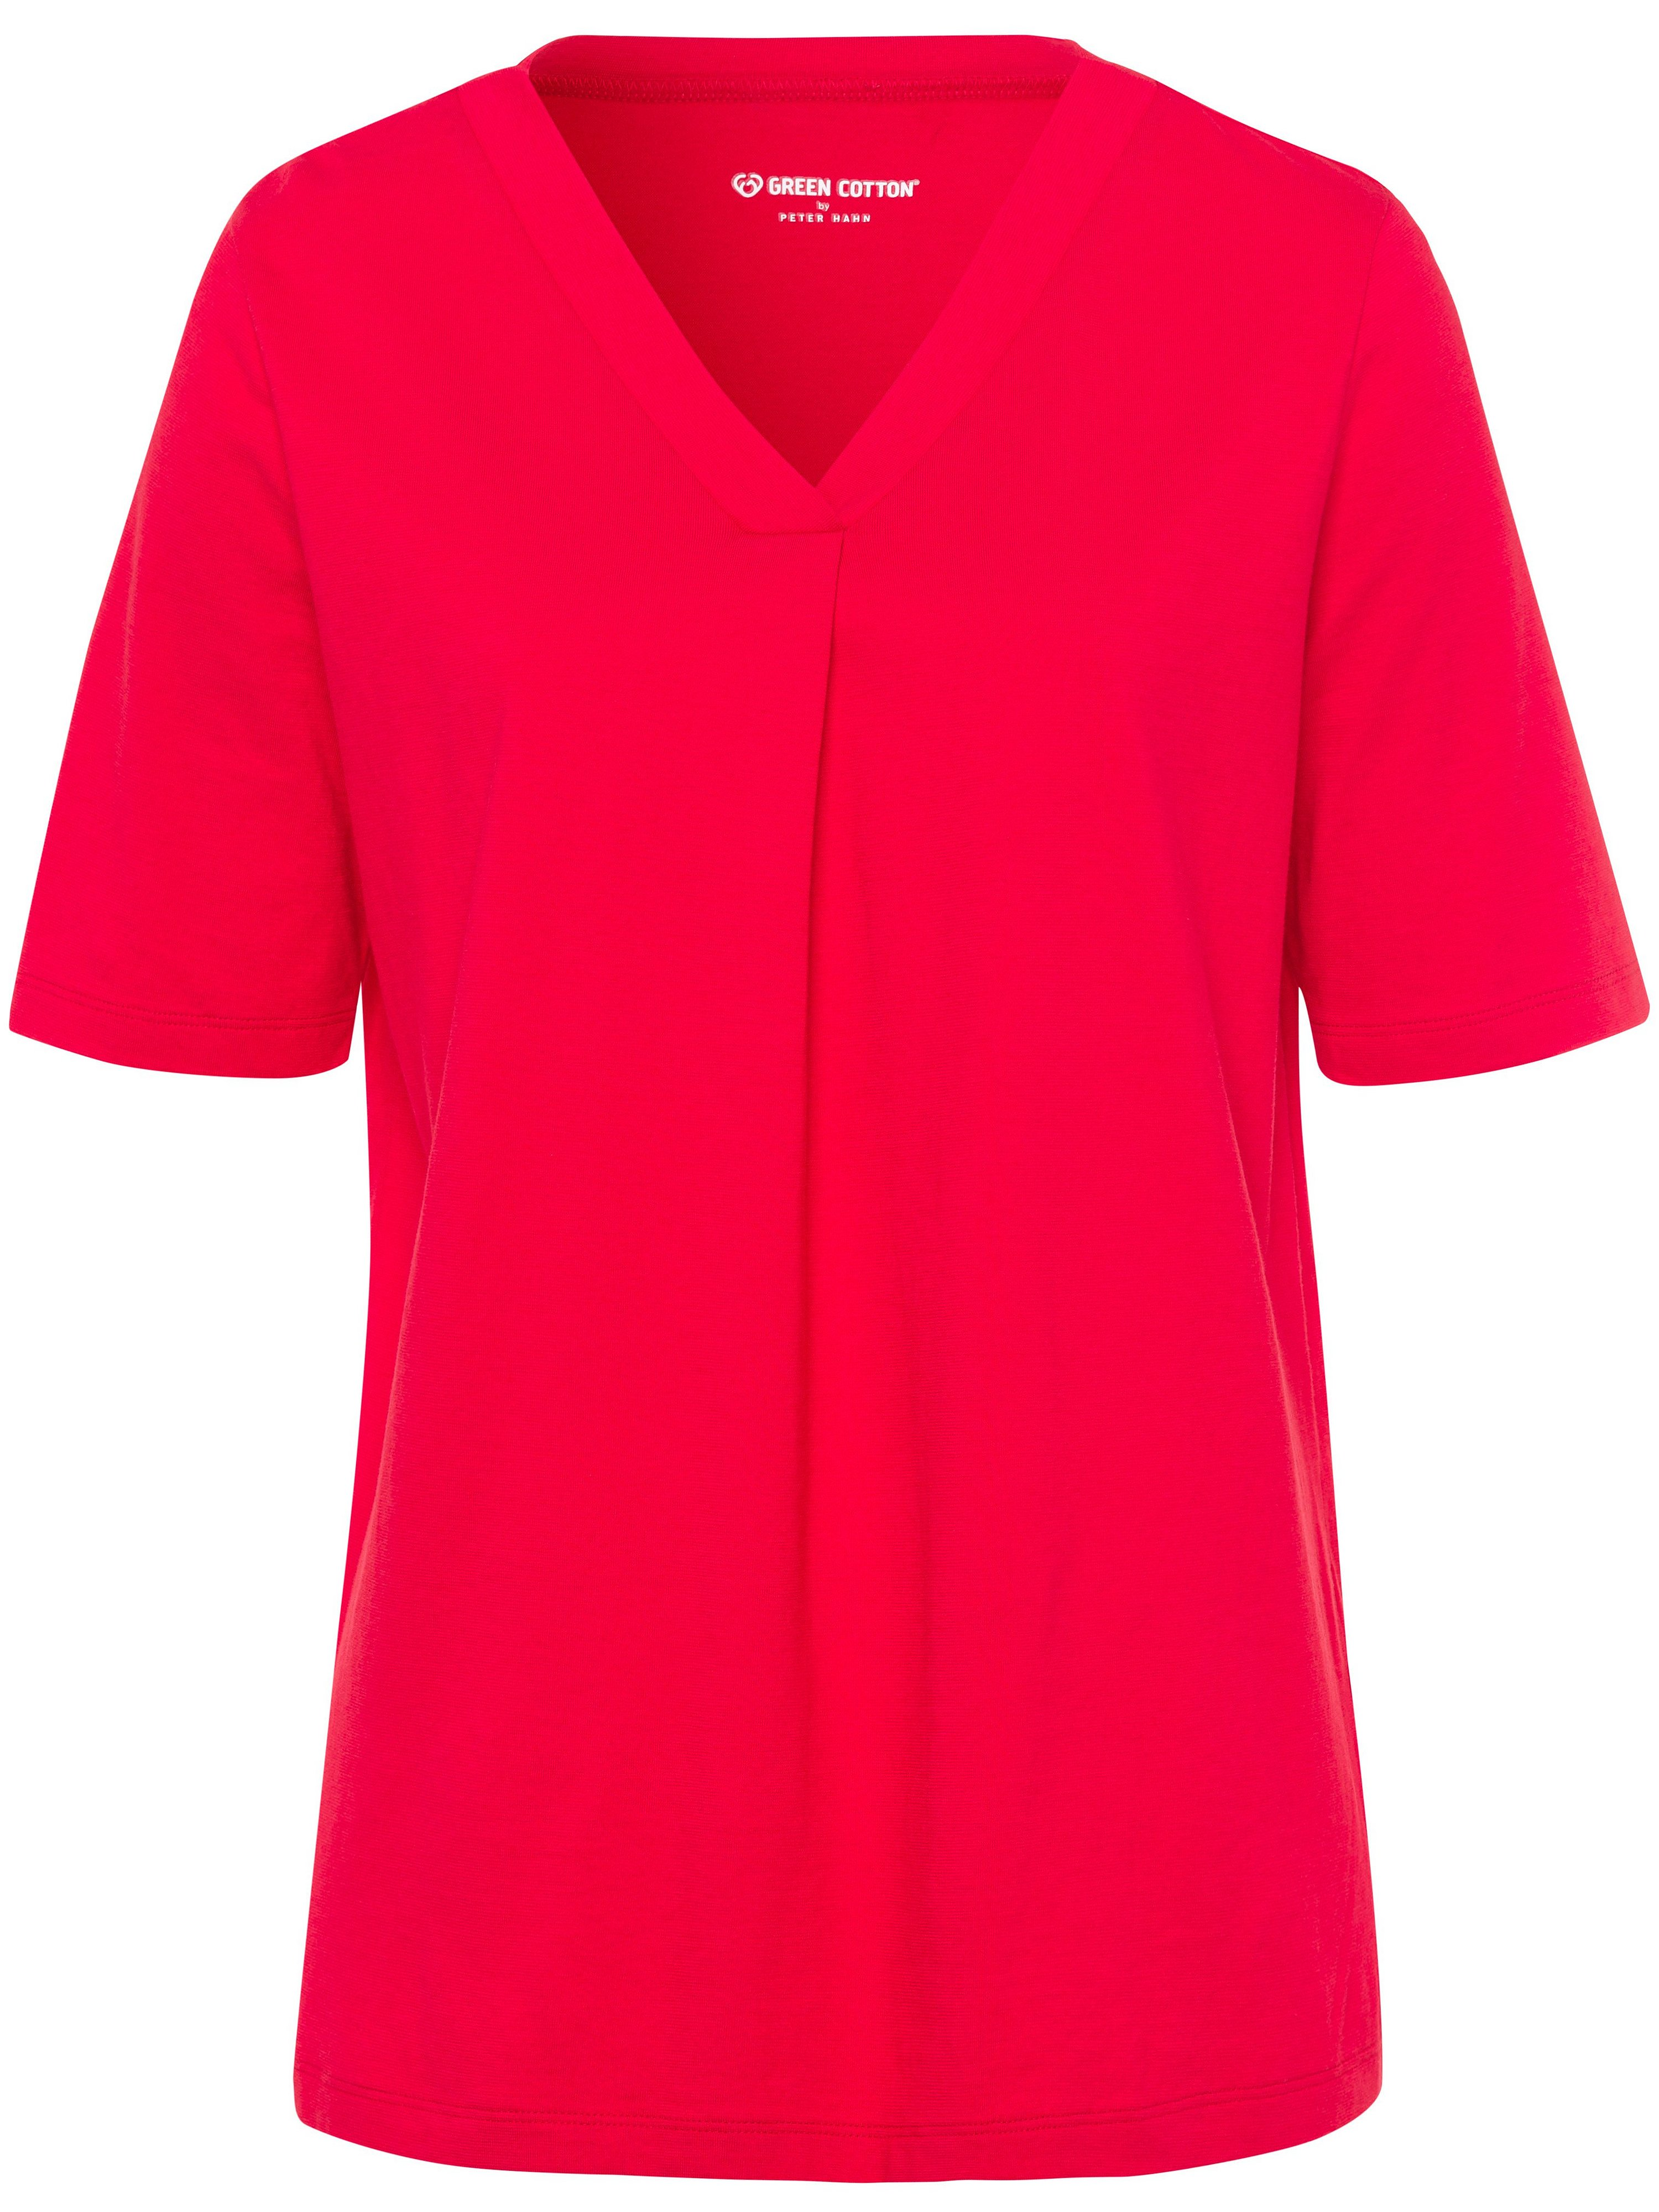 green cotton - T-Shirt  rot